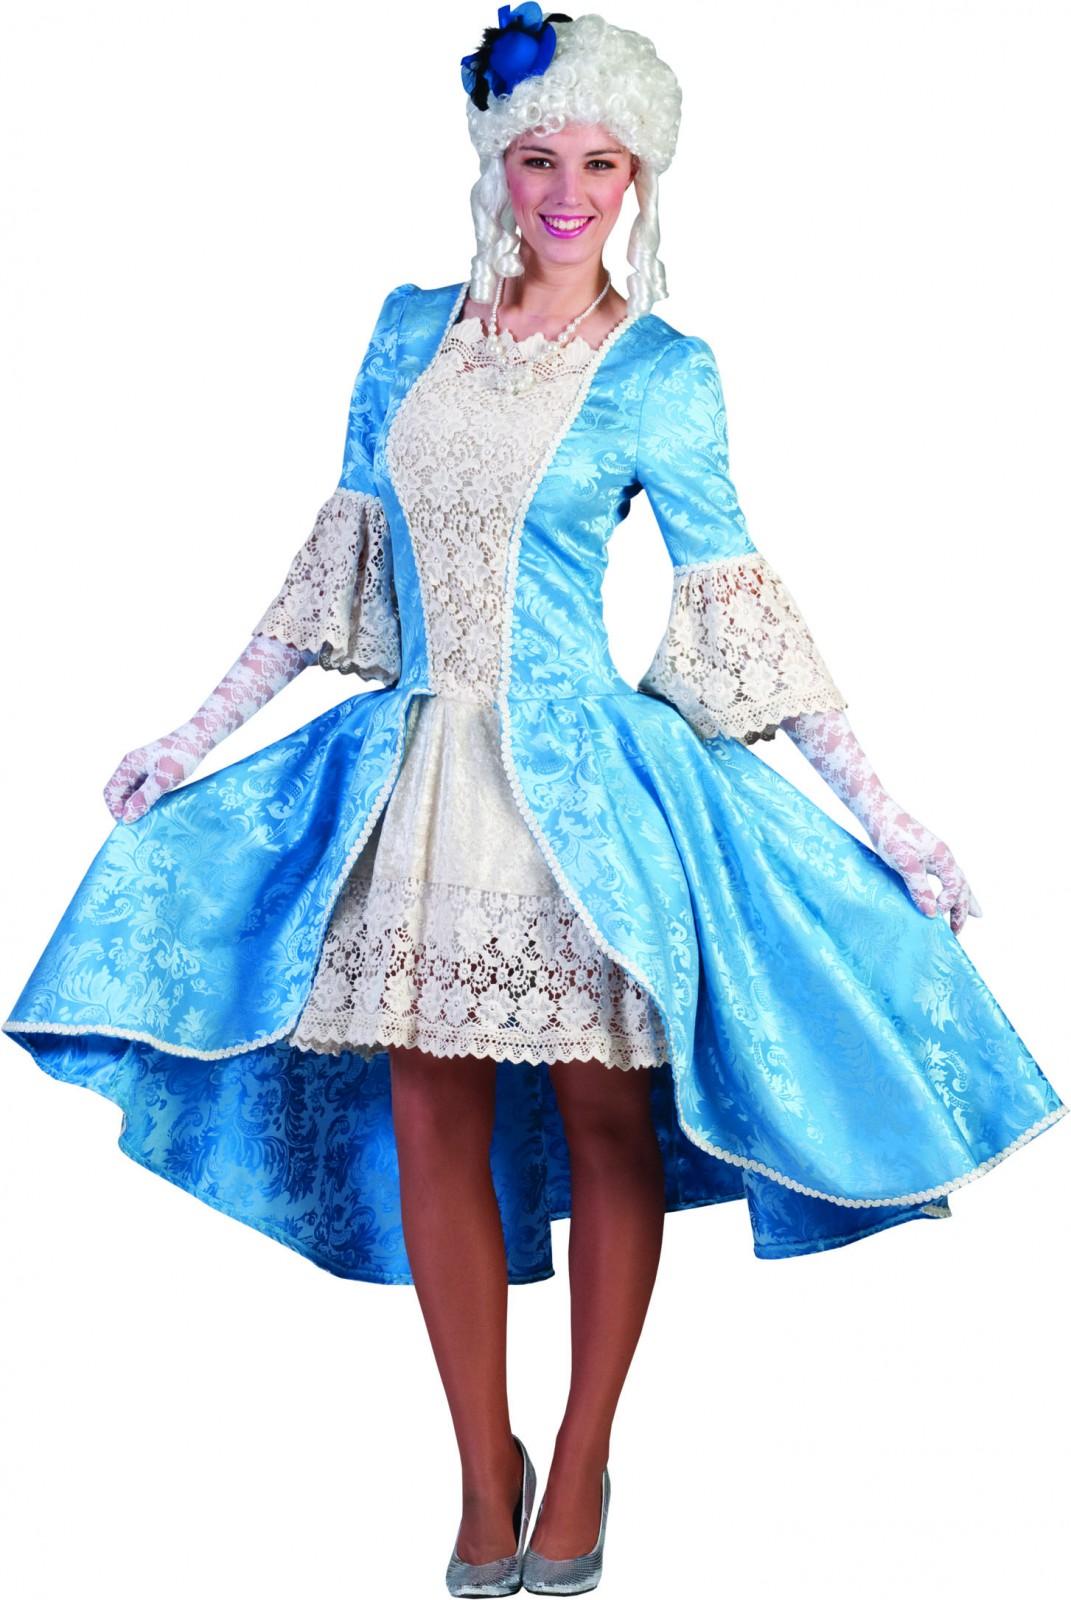 Kostum Barock Damen Herren Barockkostum Prinzessin Prinz Kostumball